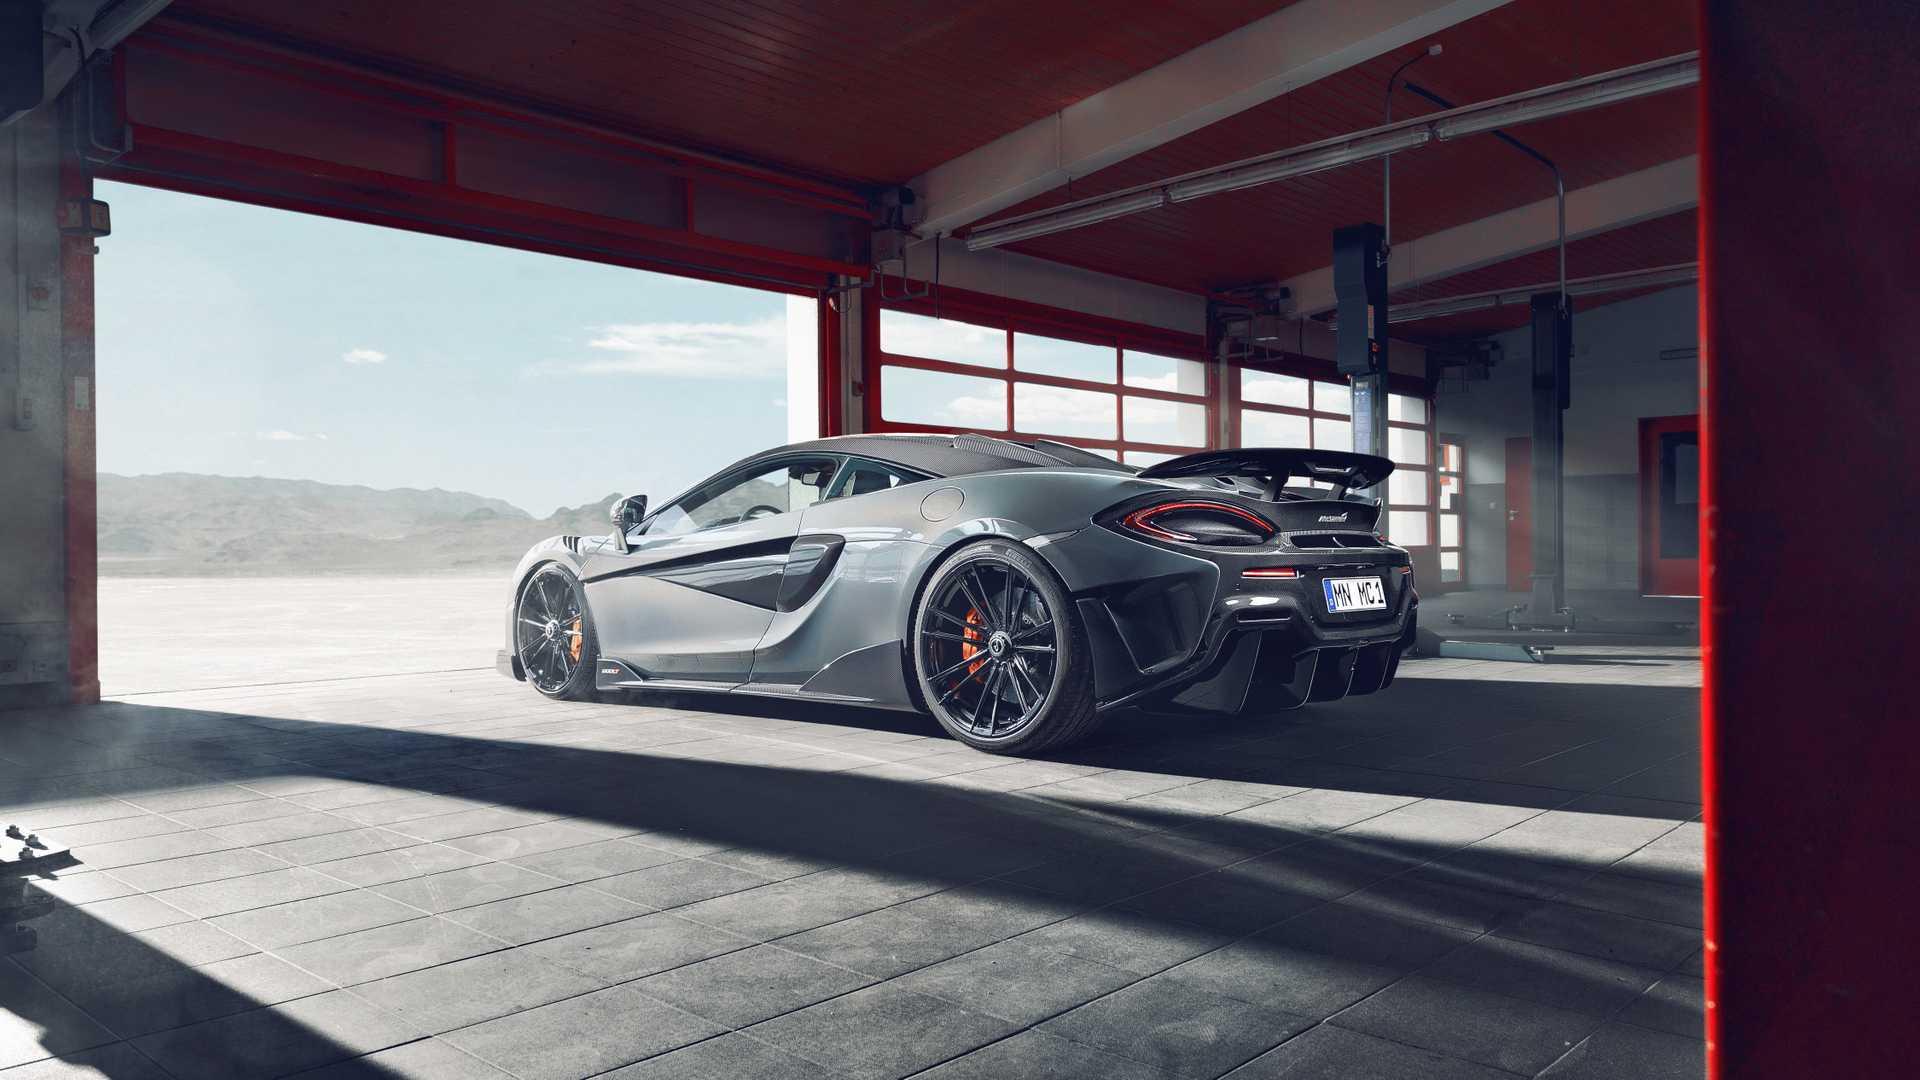 2019 NOVITEC McLaren 600LT Rear Three-Quarter Wallpapers (5)